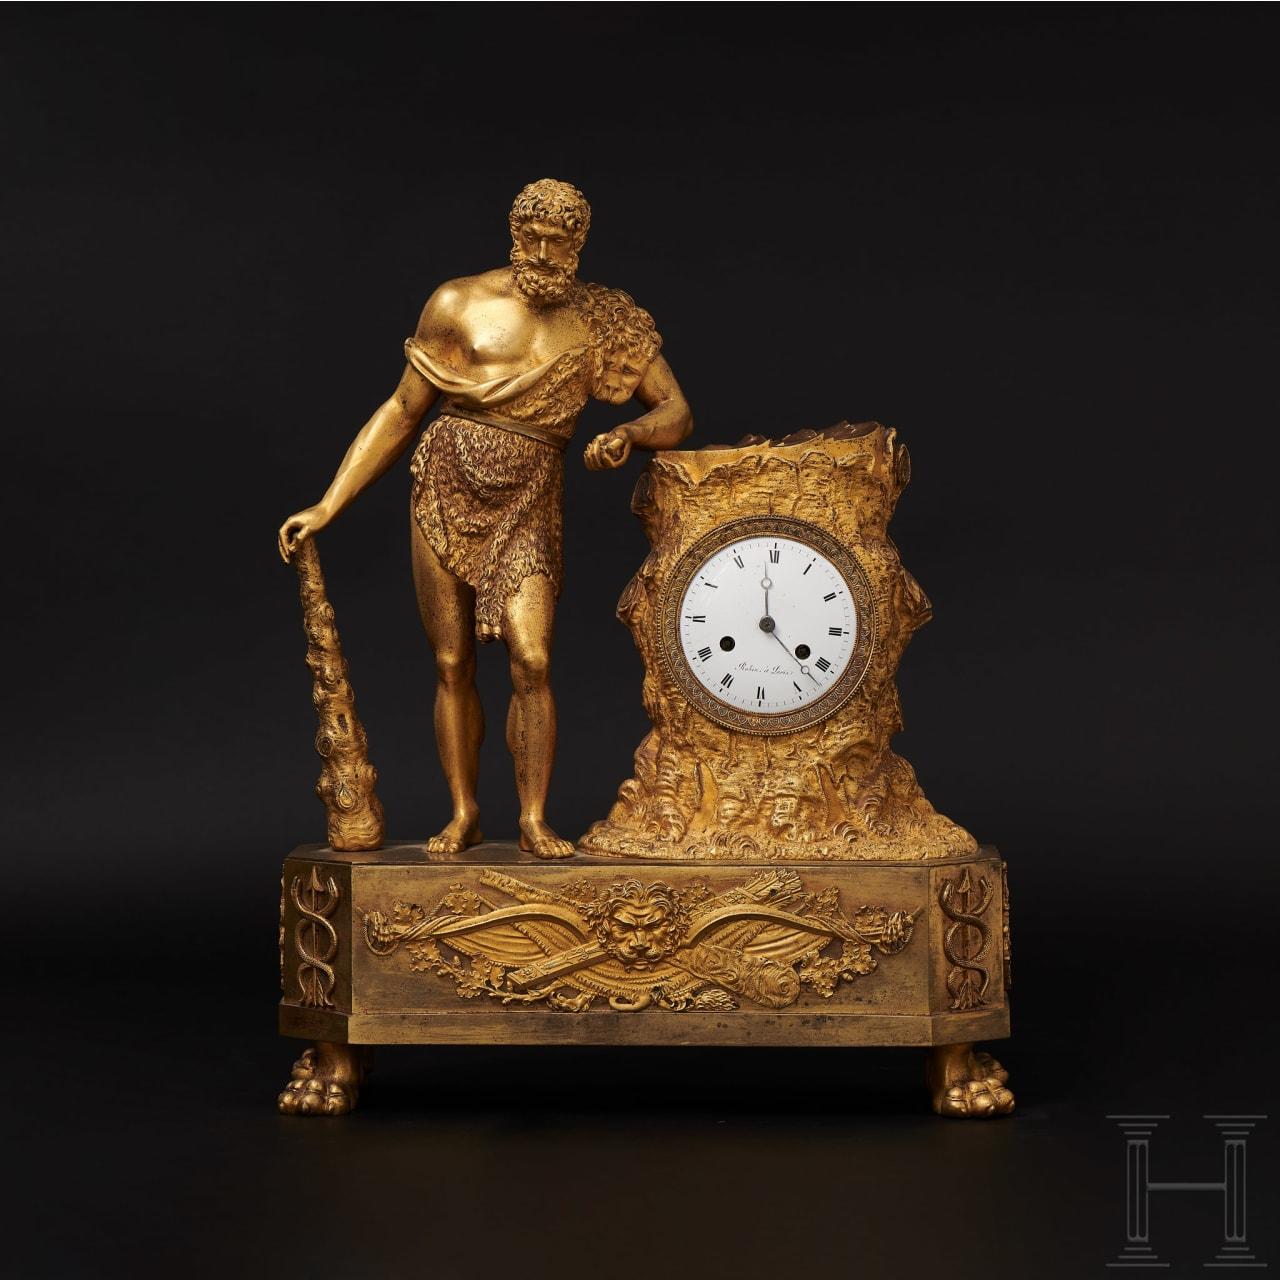 An Empire-style mantel clock with a Hercules figurine, Paris, circa 1810/15